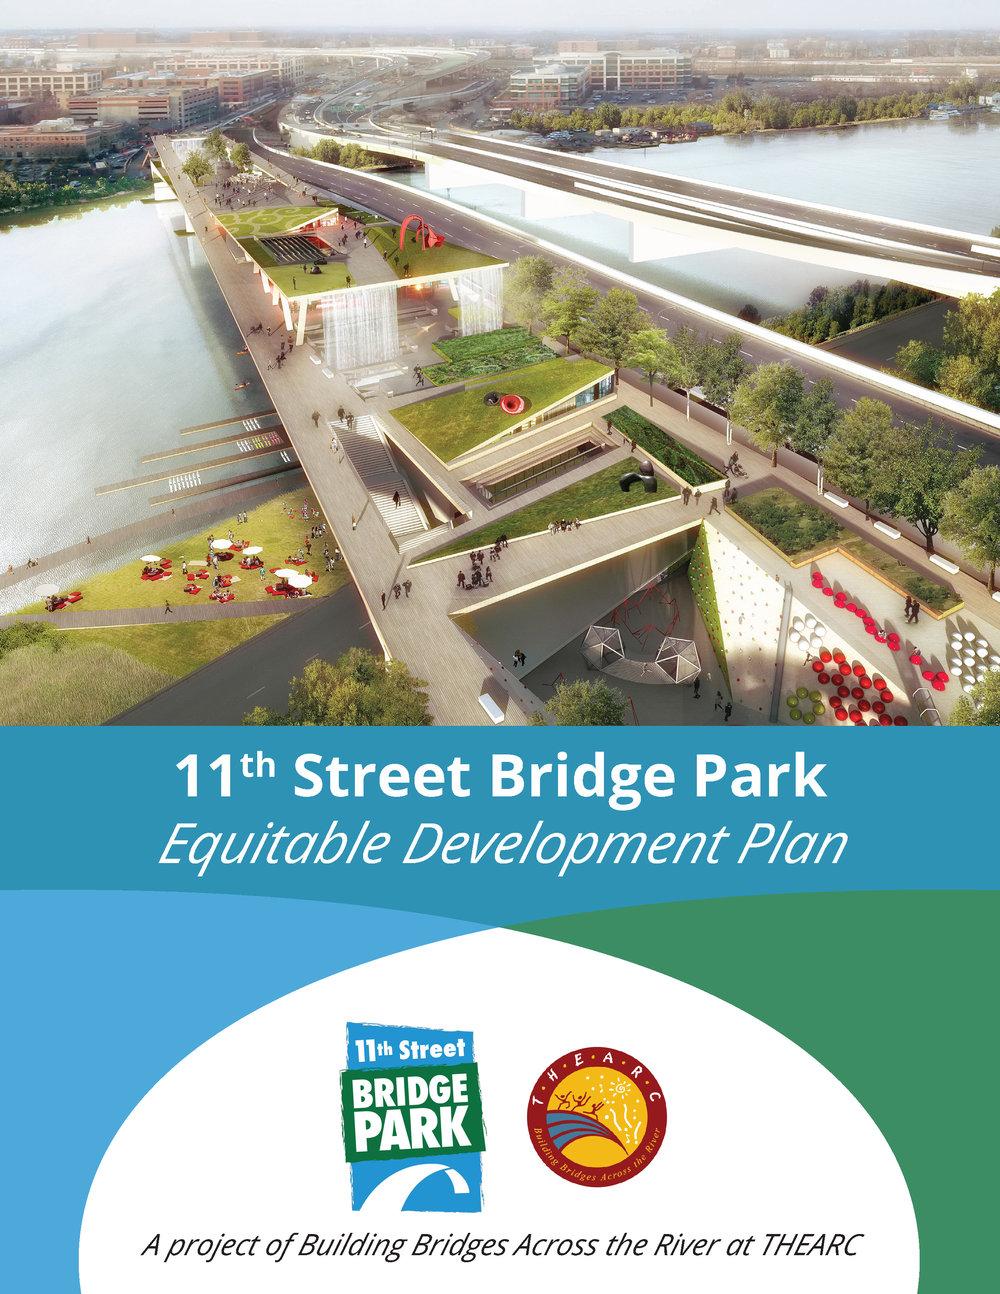 11th Street Bridge Park's Equitable Development Plan